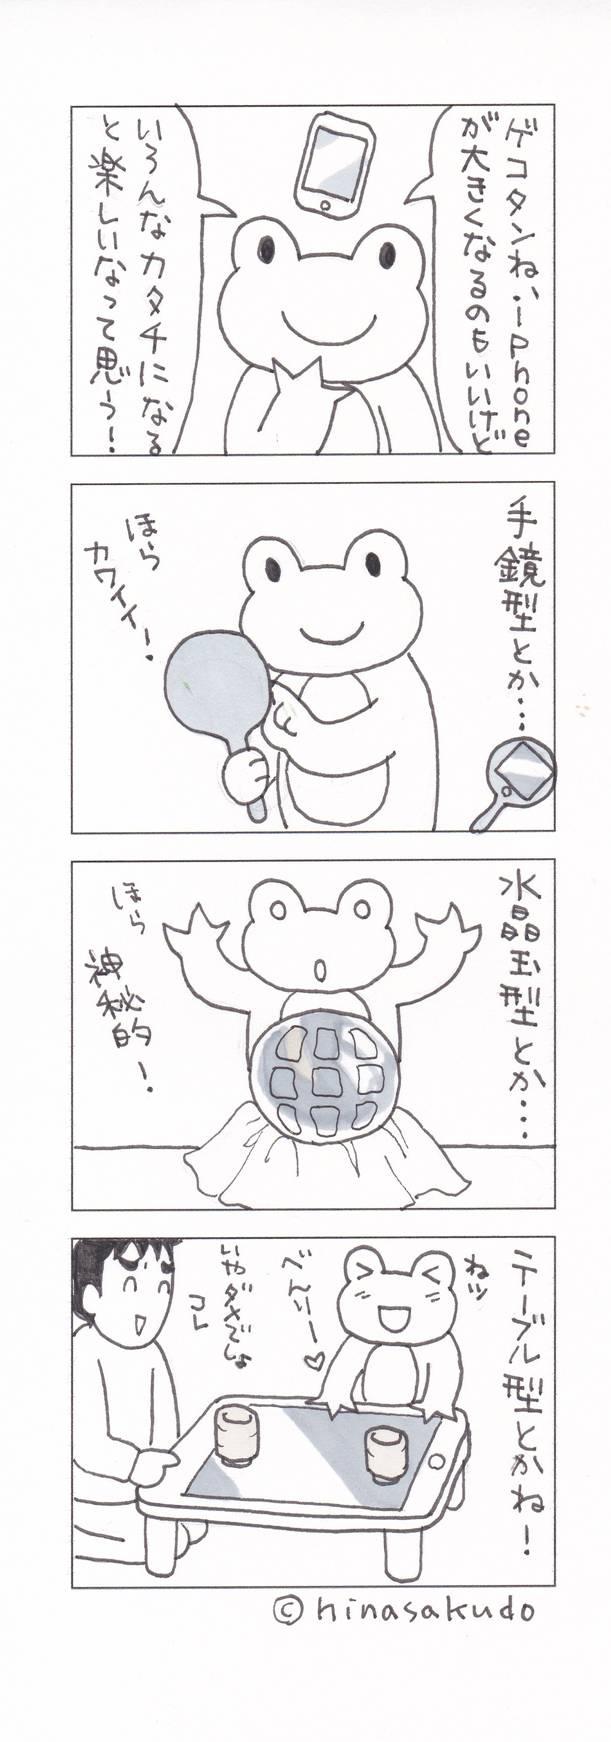 140925�������ӂ���6_611.jpg